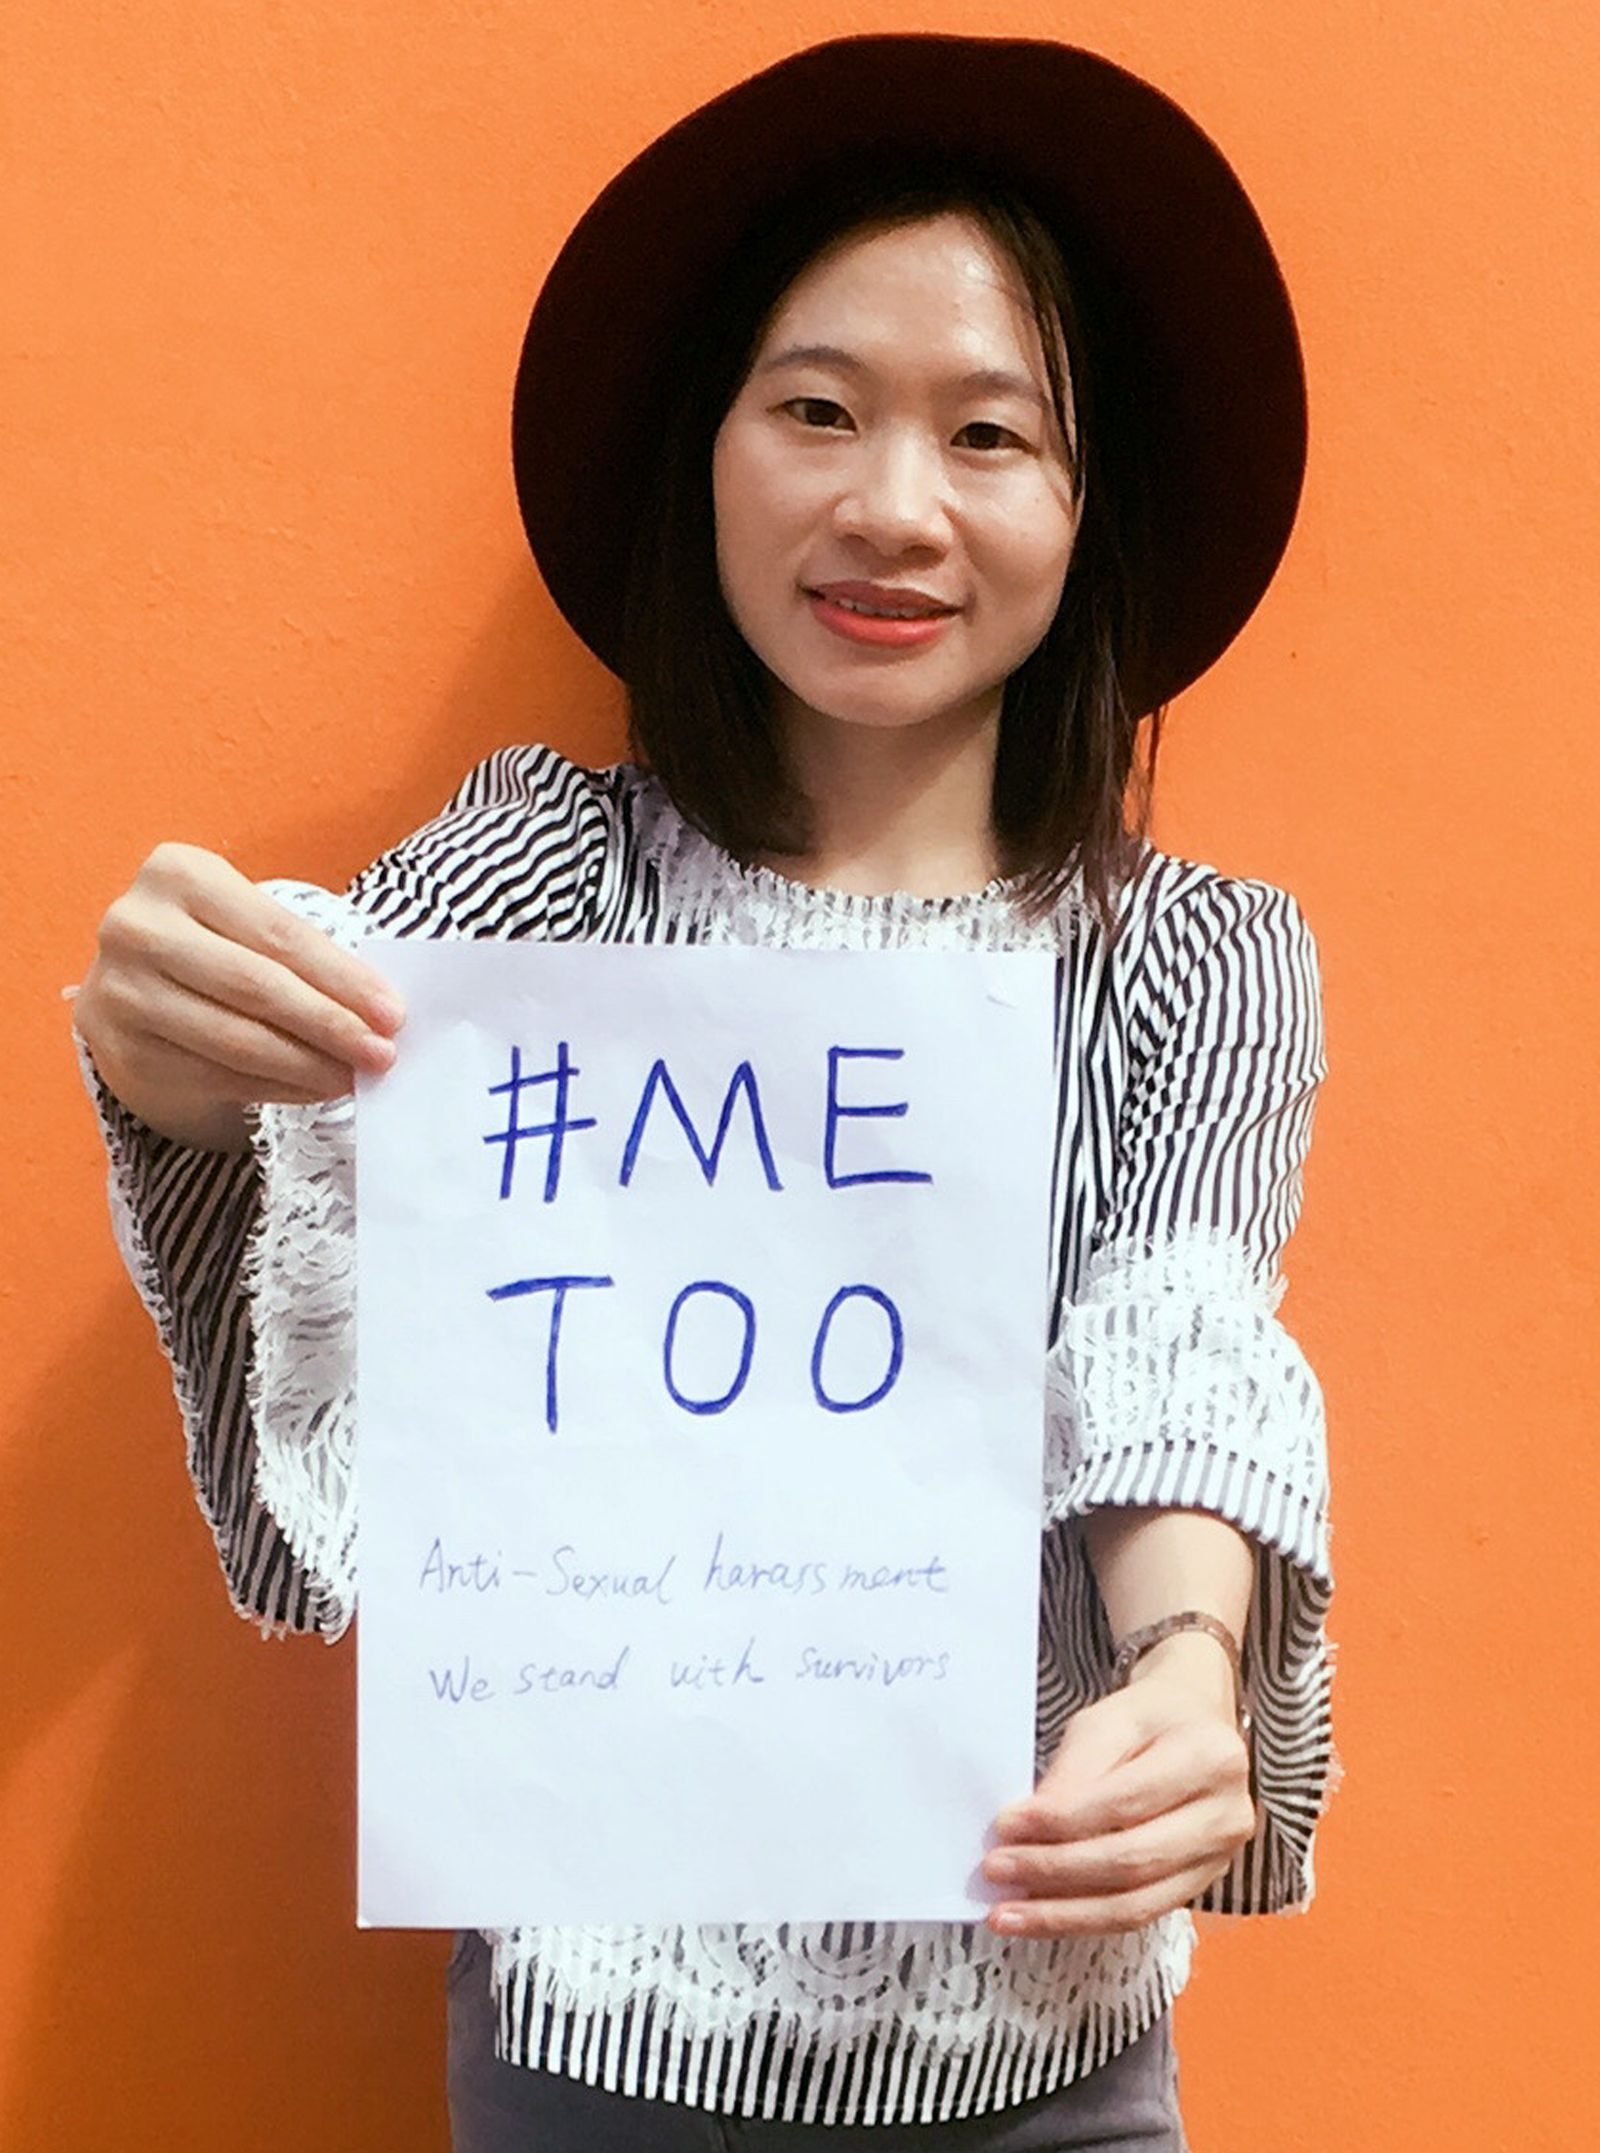 #MeToo-Aktivistin in China festgenommen